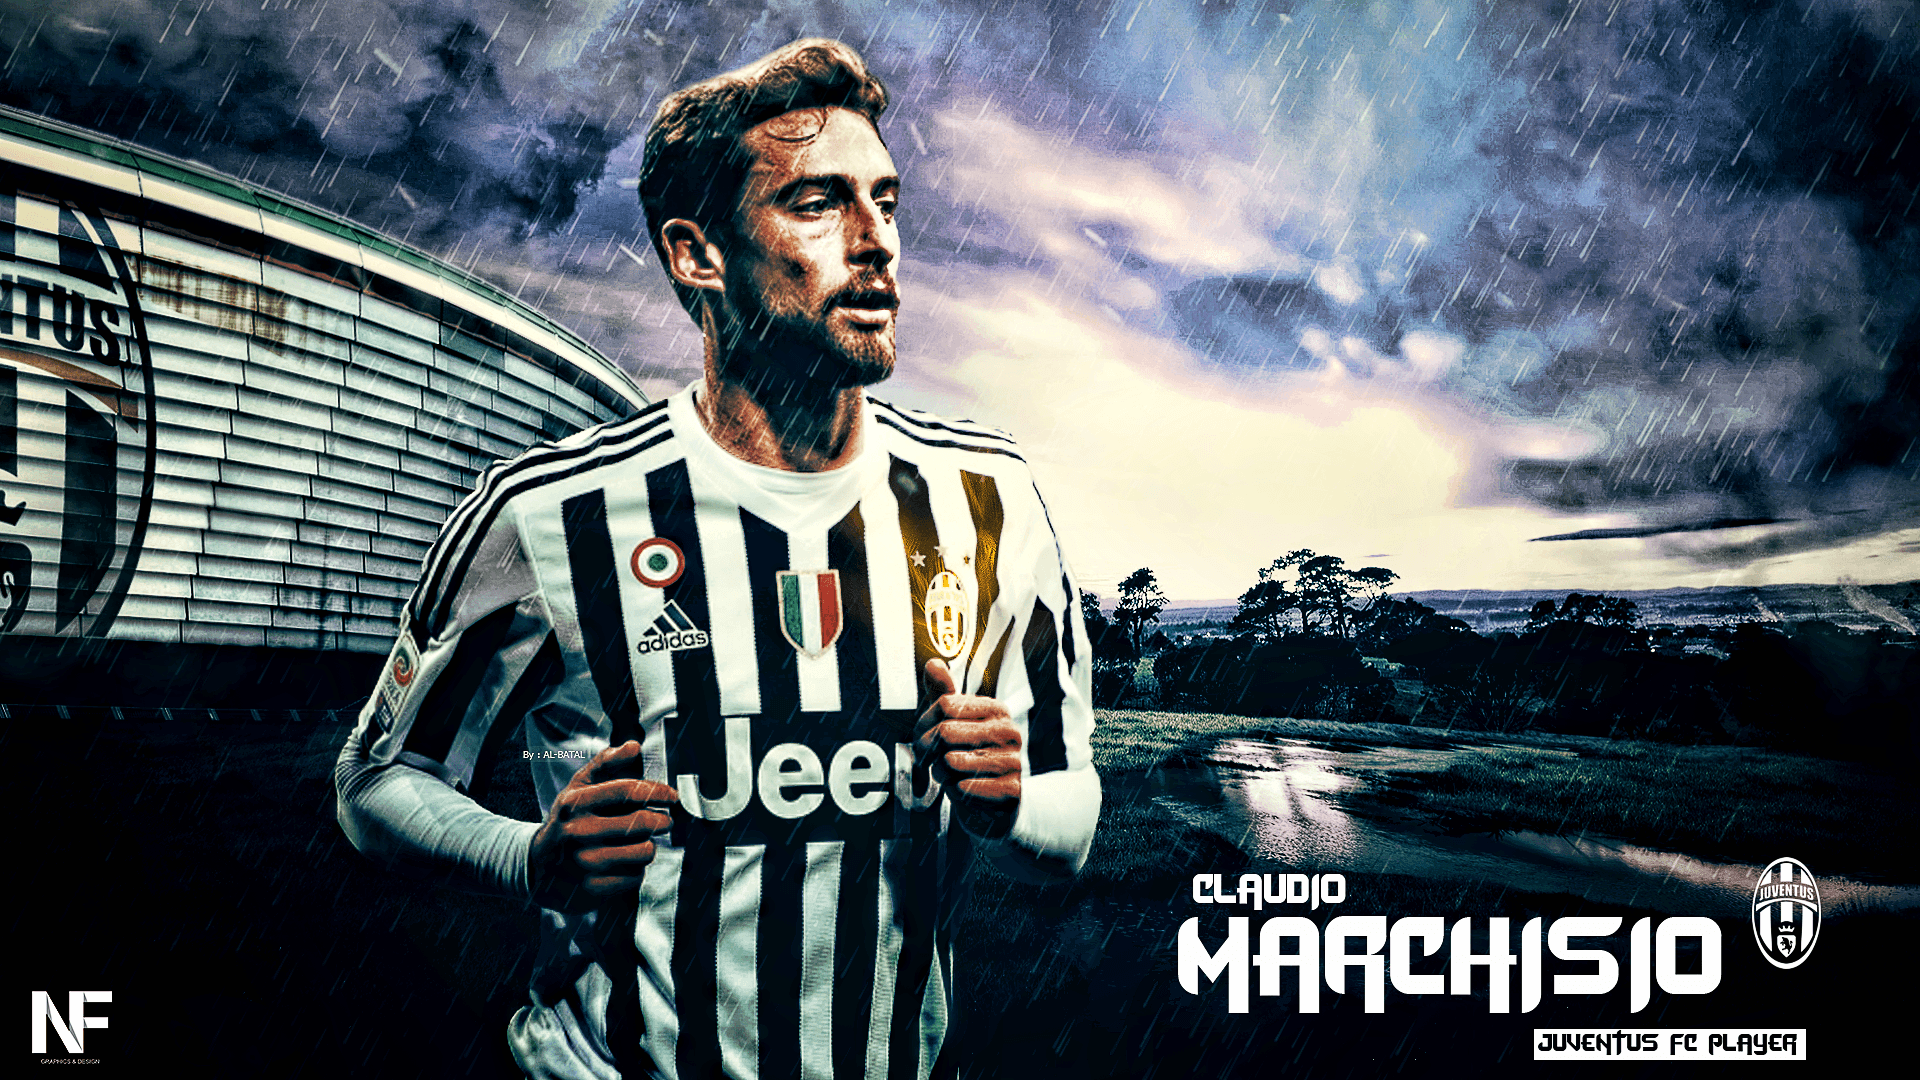 98 ] Claudio Marchisio Wallpapers On WallpaperSafari